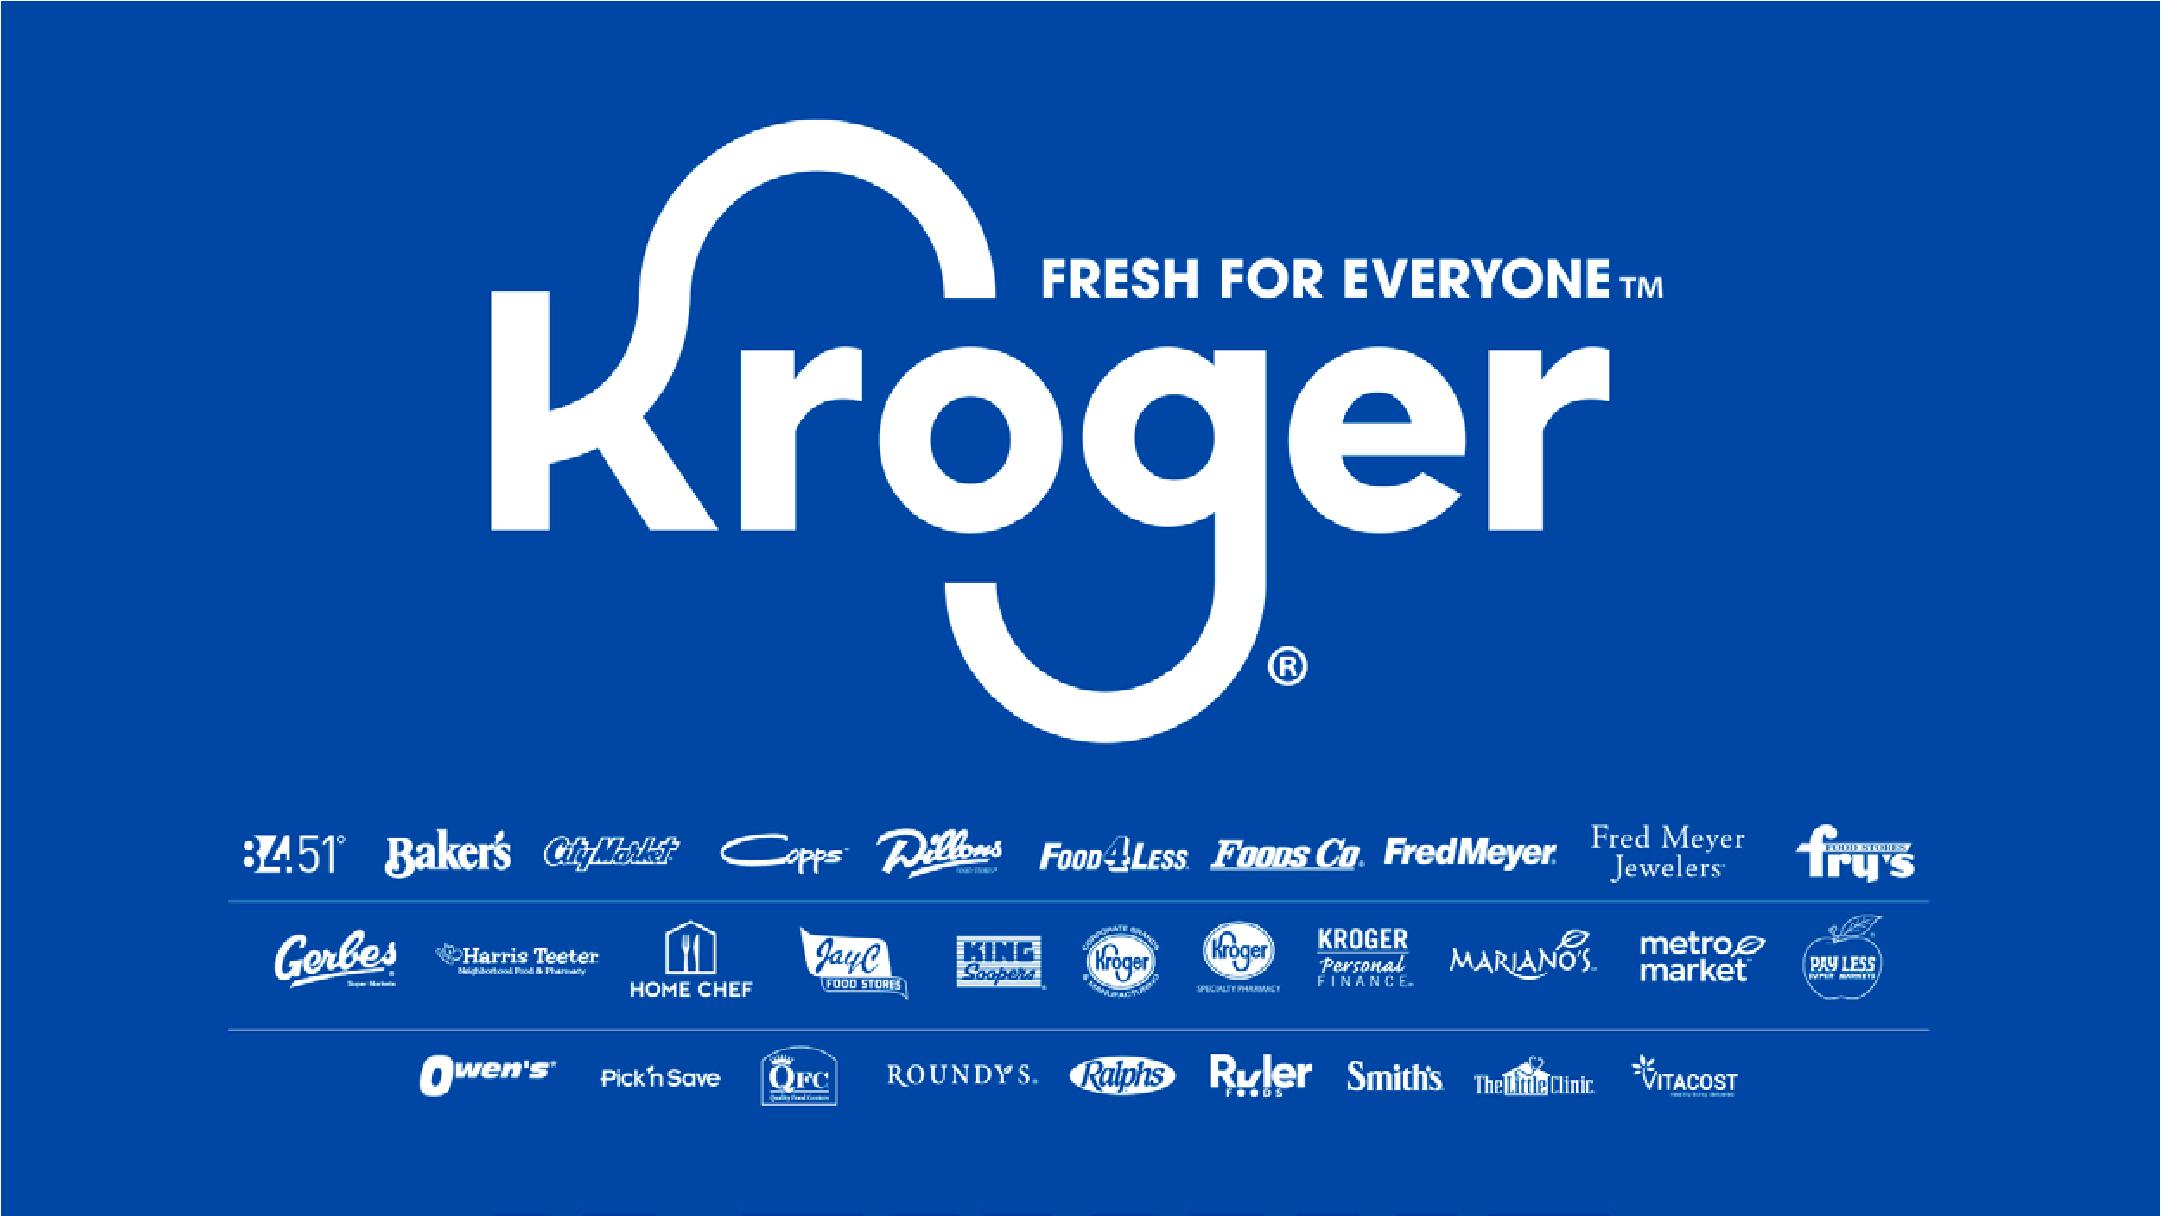 Kroger Fresh for Everyone brands